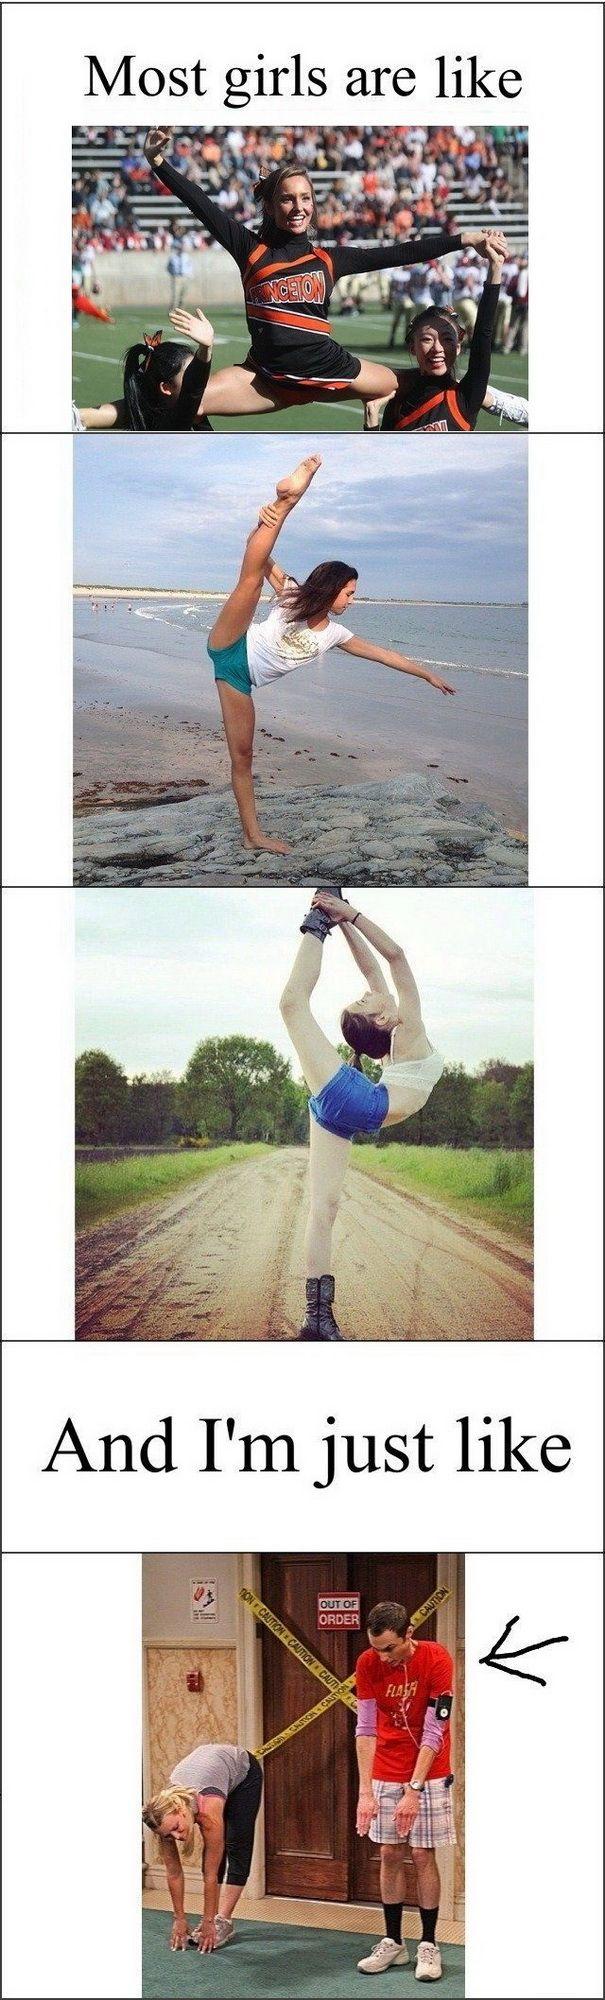 a957b5c6f61f00ba60959a86b27be261 funny memes about life gym junkie best 25 memes about girls ideas on pinterest funny usernames